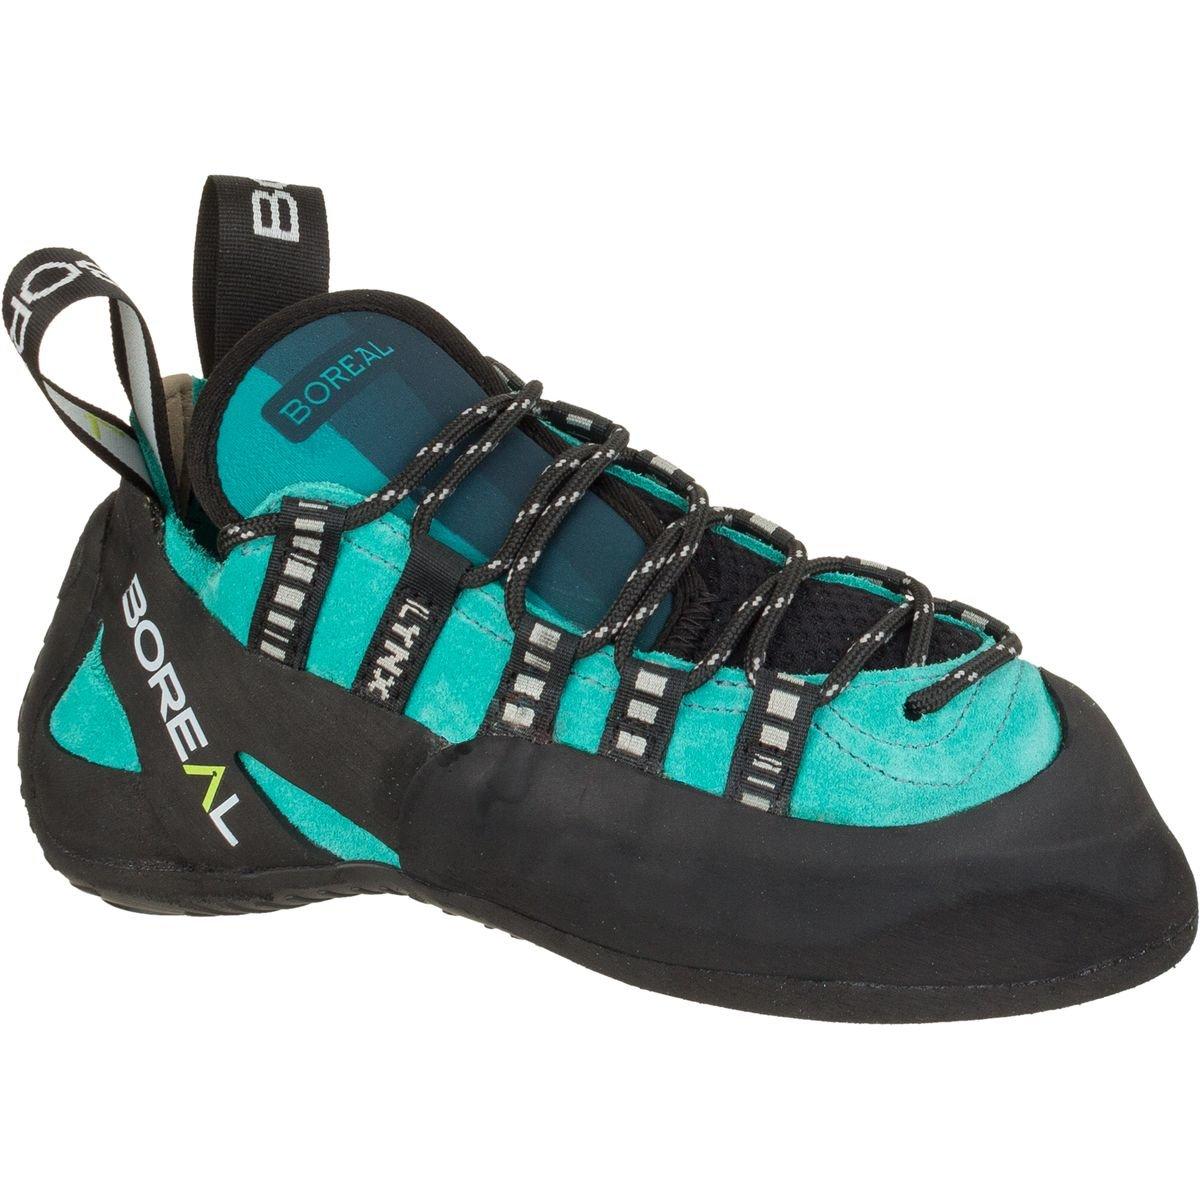 Boreal Lynx Climbing Shoe - Women's One Color, US 9.0/UK 6.5